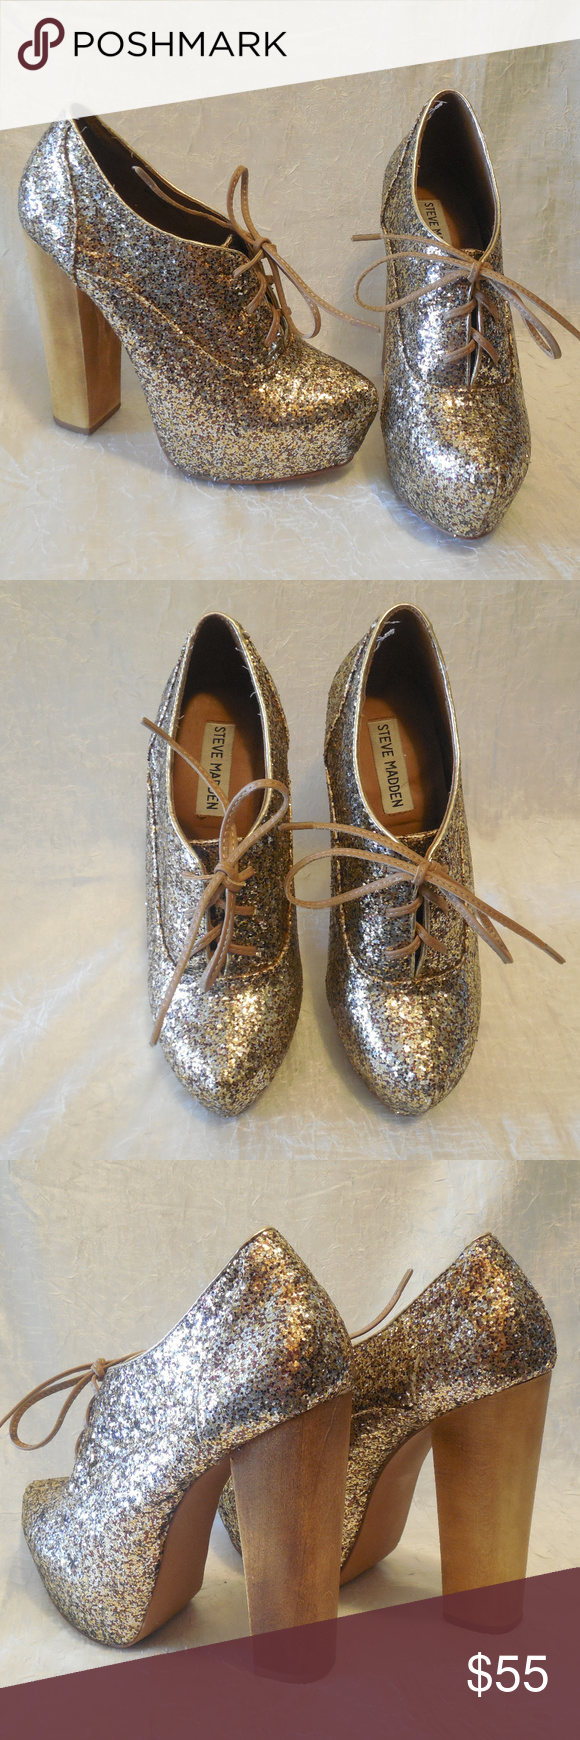 f9eb2212328 Steve Madden Cirkus Glitter Lace Up Booties Heels Gold glitter lace ...